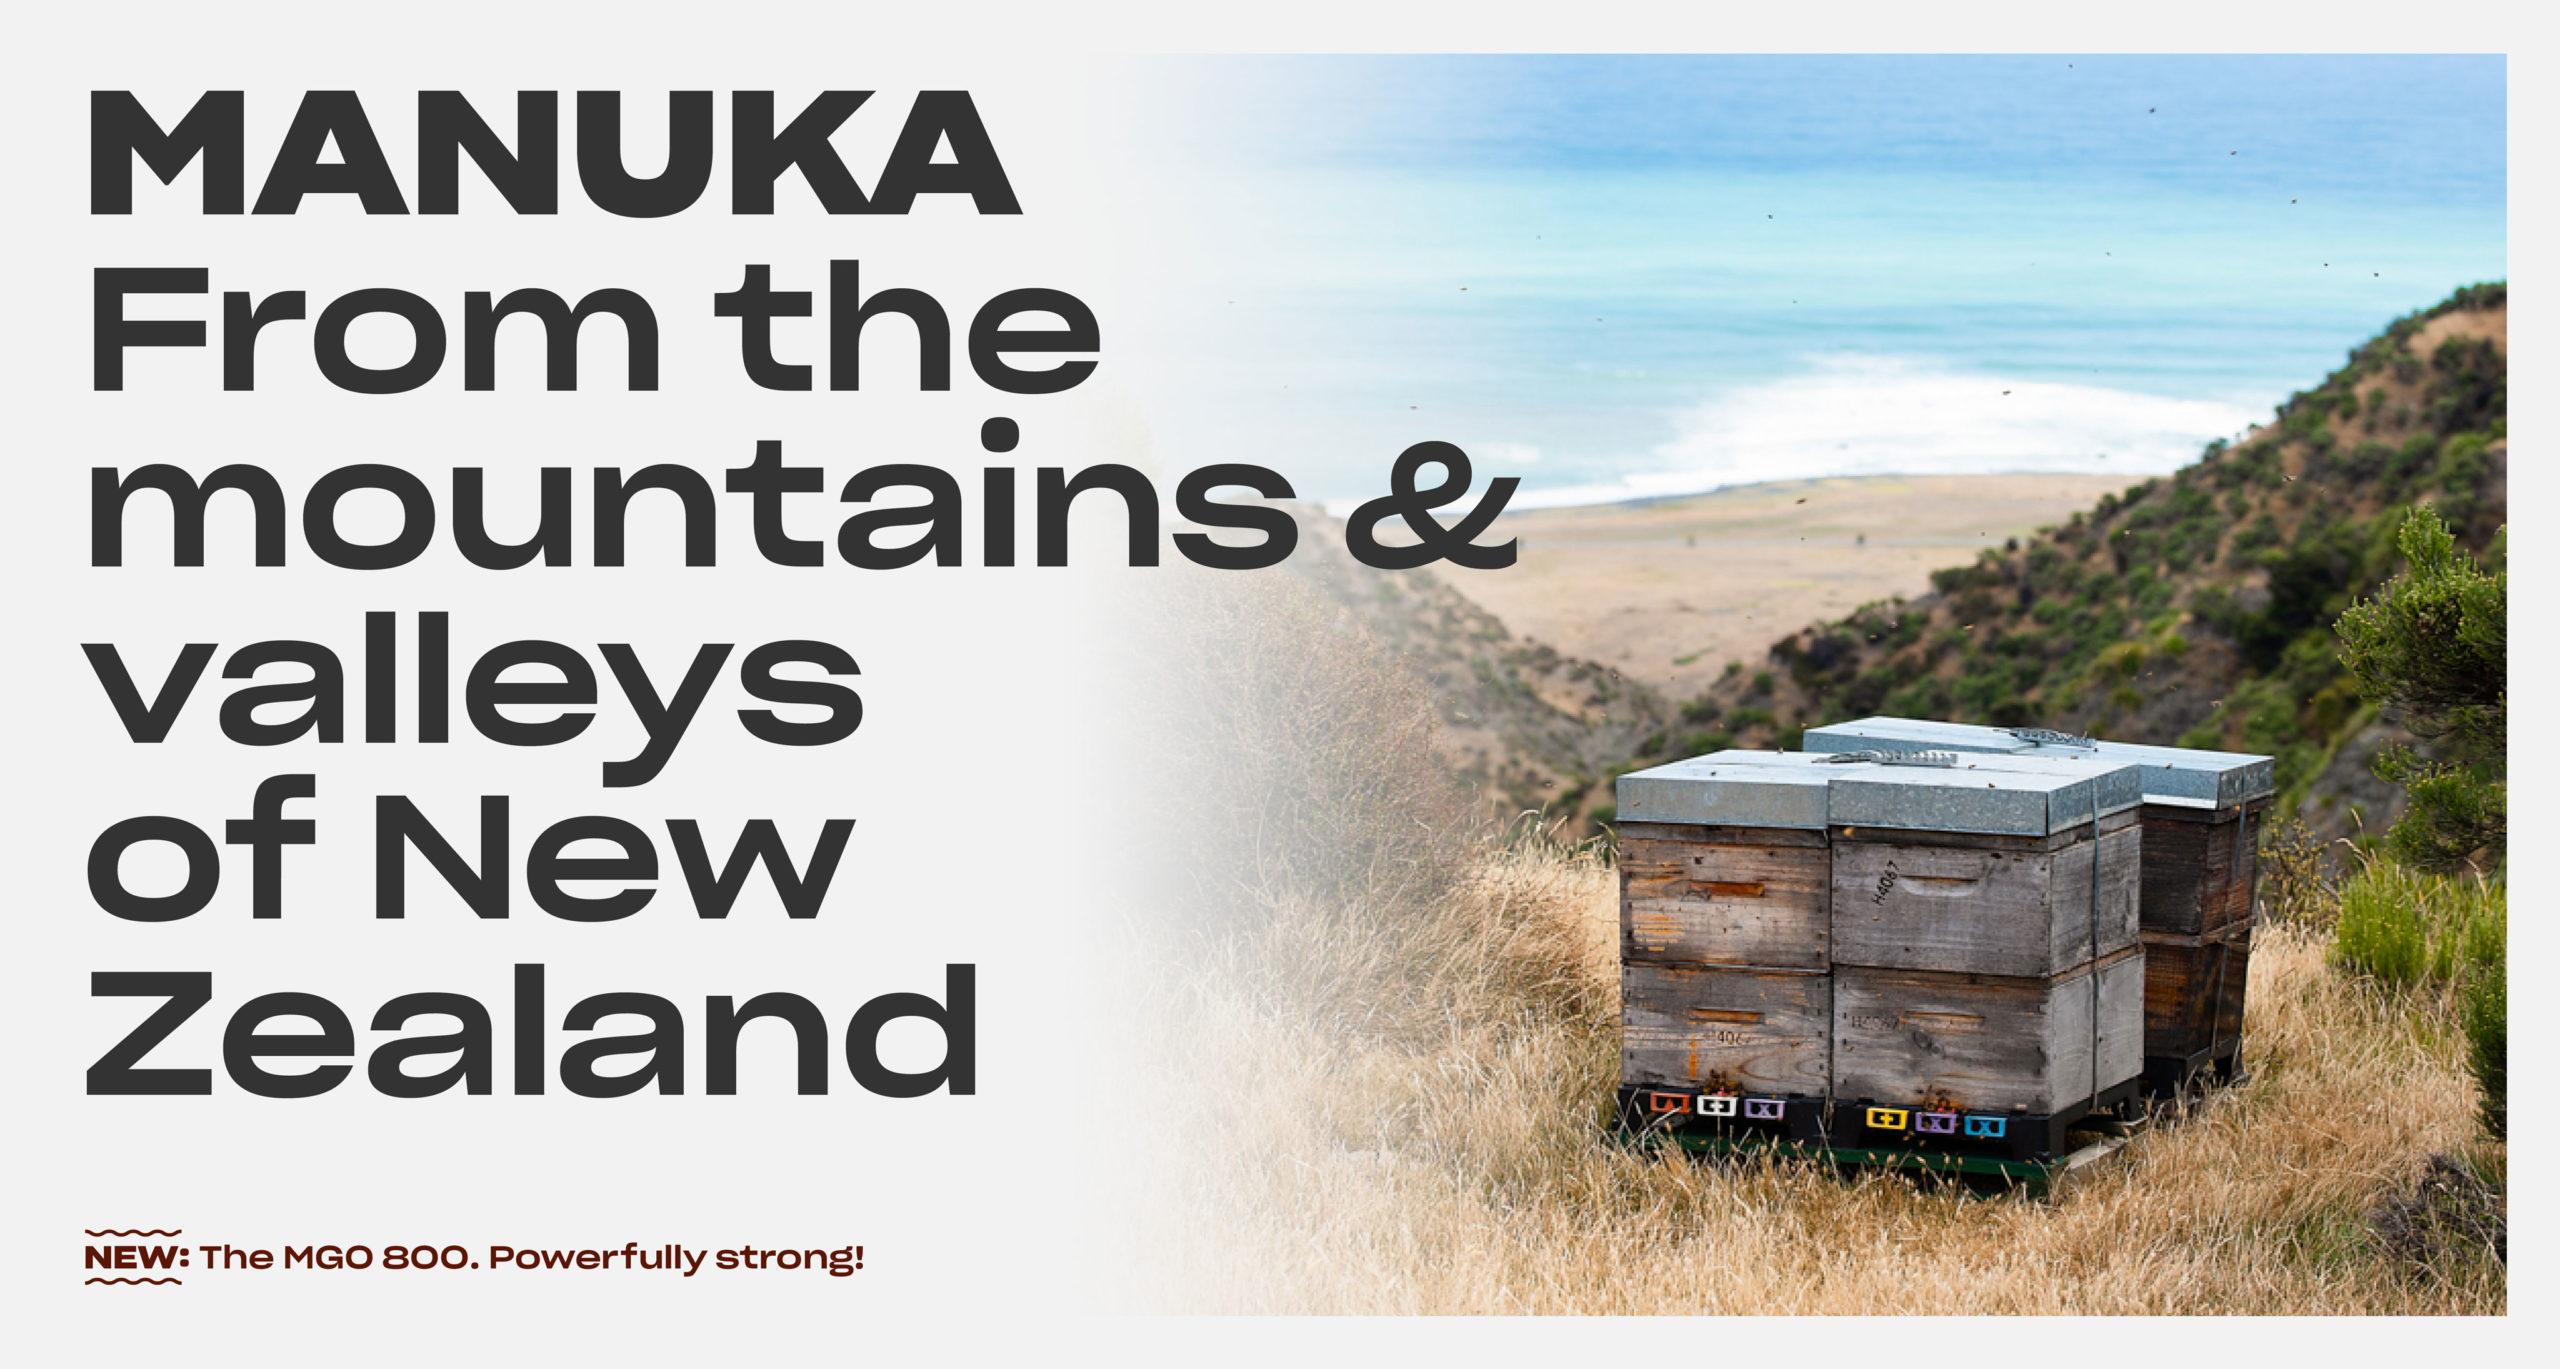 Manuka honey from the mountains of New Zealand